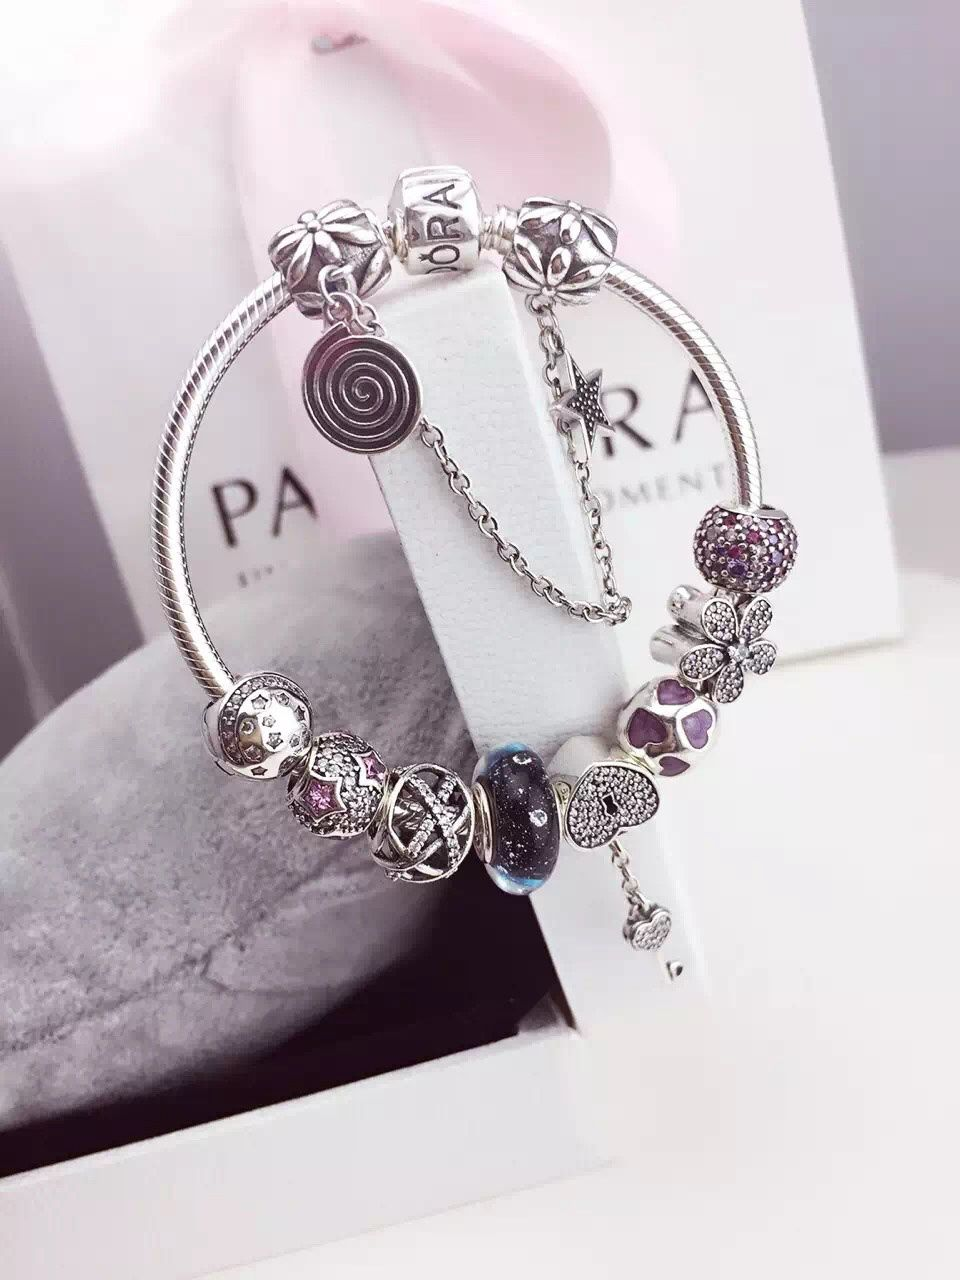 Pandora Sterling Silver Charm Bracelet CB01736 - Pandora ...